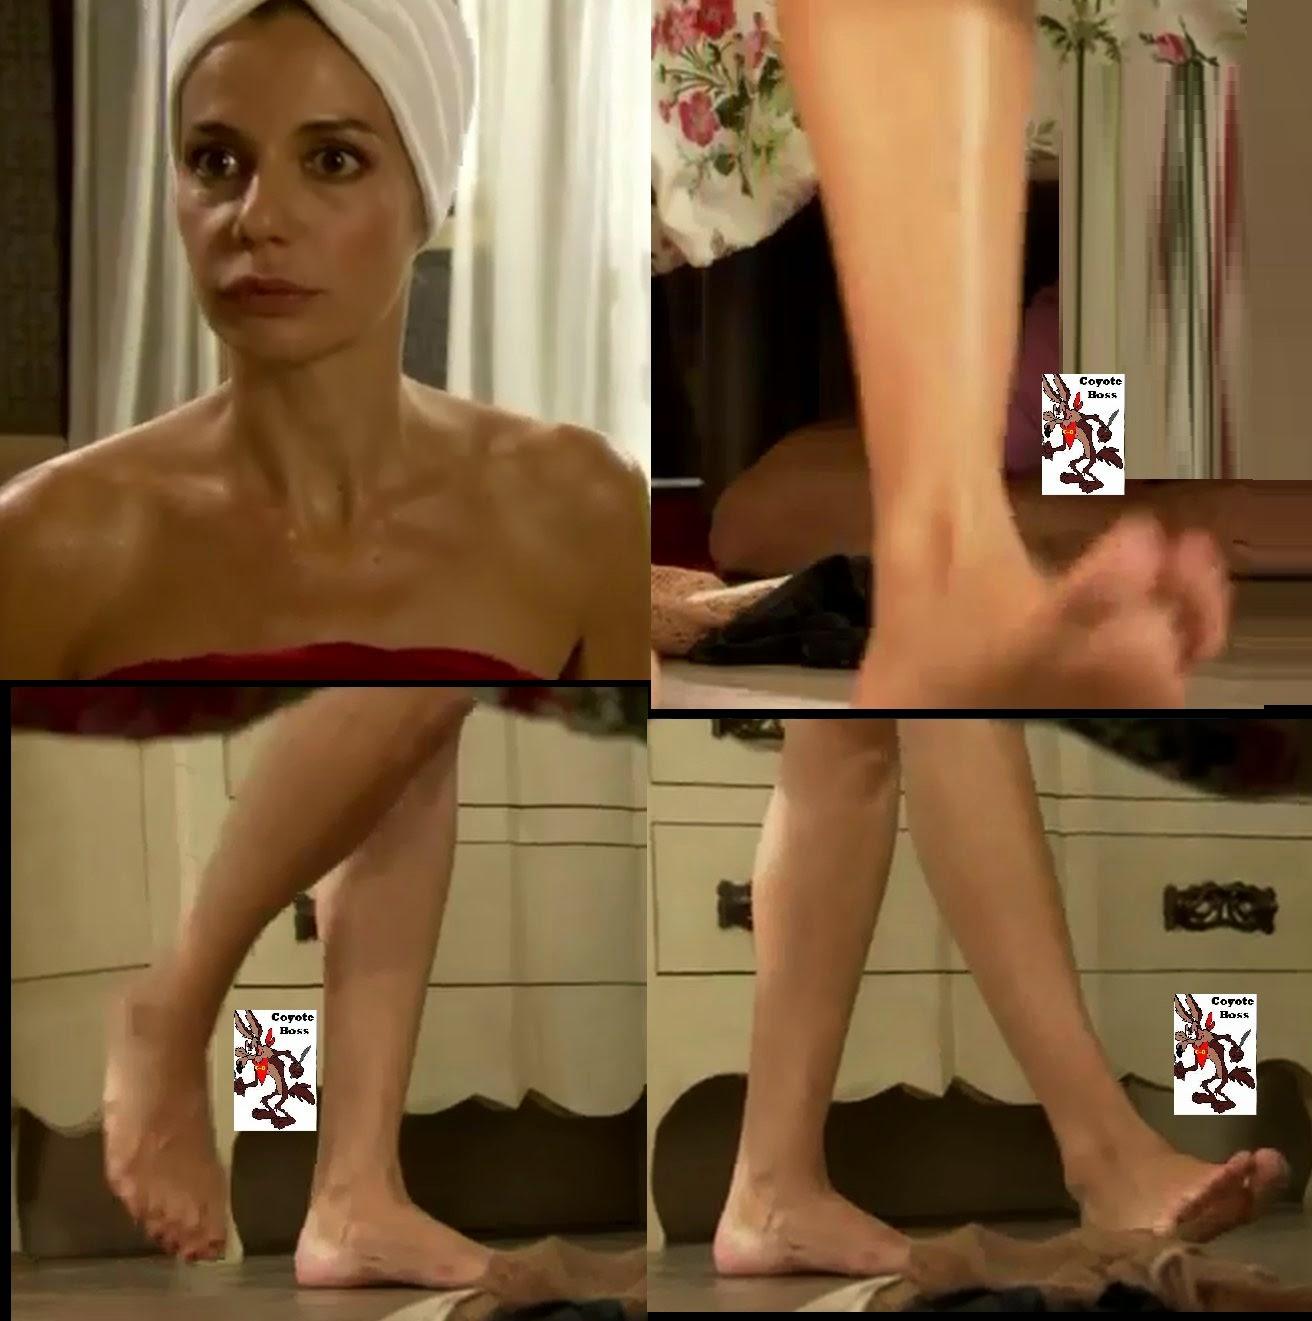 Cristina Peña-Pies de chicas